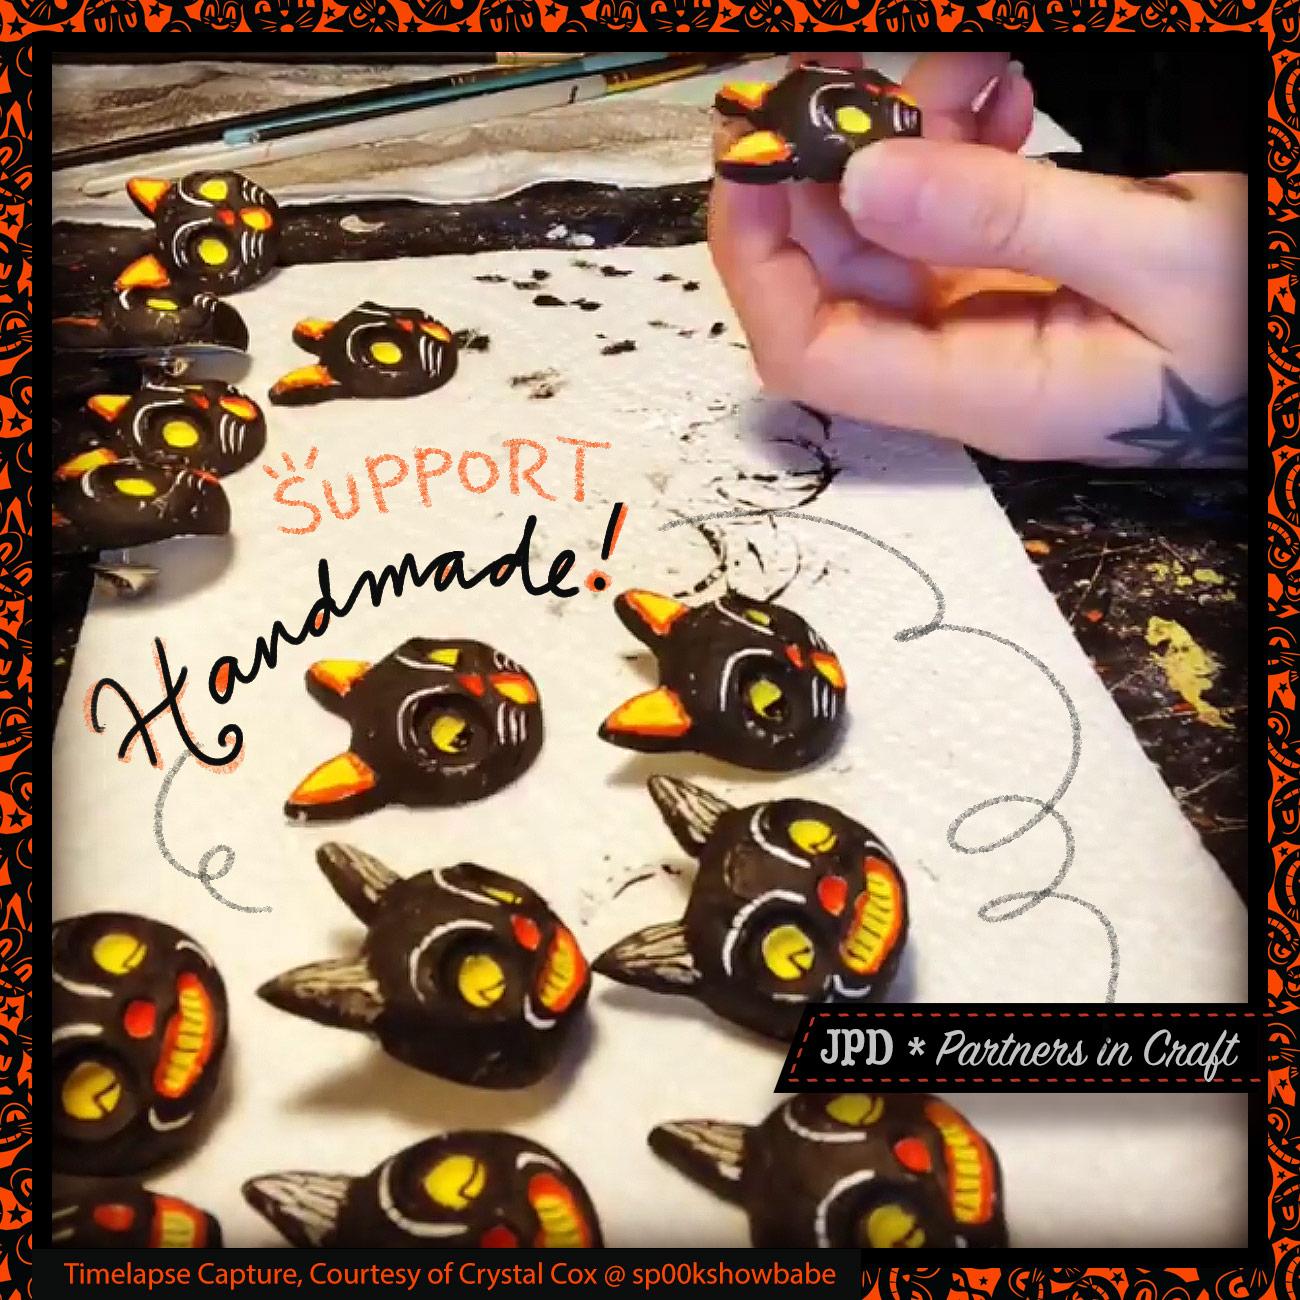 JPD Partners in Craft * Spookshow Babe Designs + Johanna Parker Design * Artist Collaboration